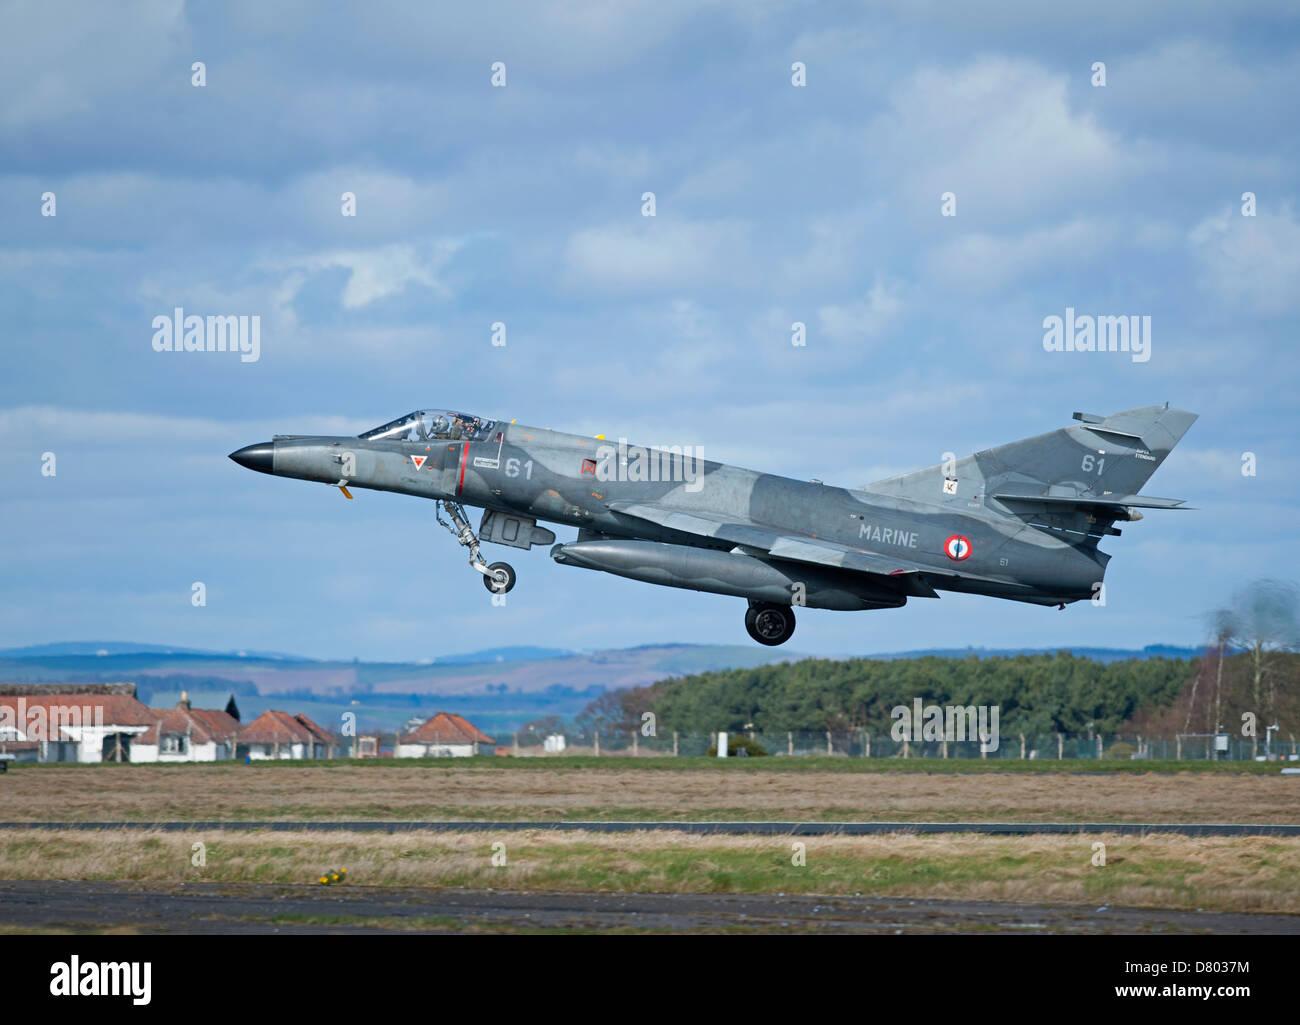 Dassault Super Etendard Fighter Jets Modernise 17 Flottille, Landivsiau CEPA Istres.   SCO 9119 Stock Photo